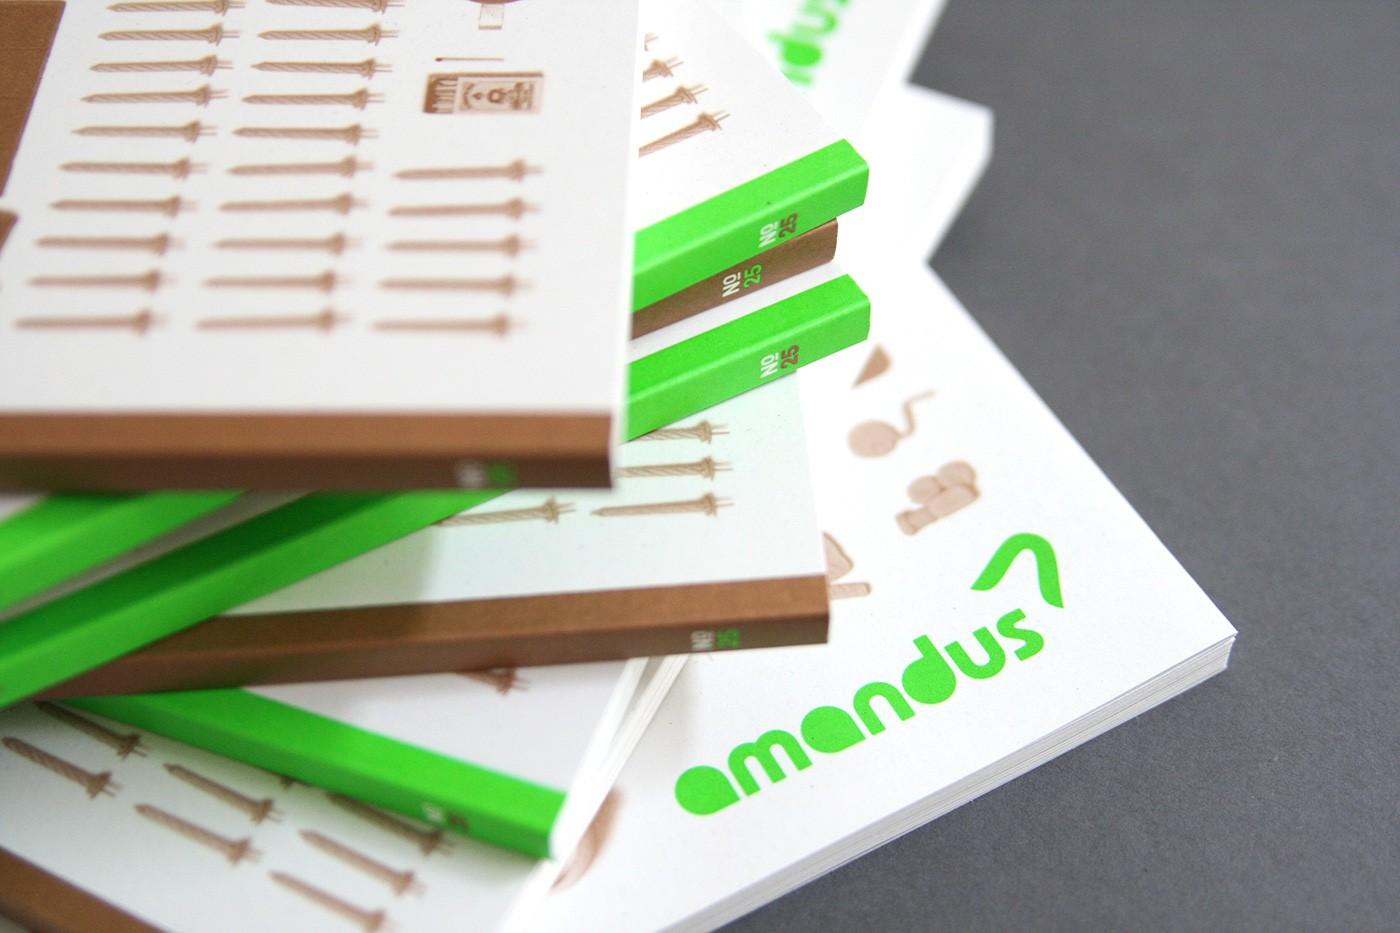 Amandus 2012 by upstruct